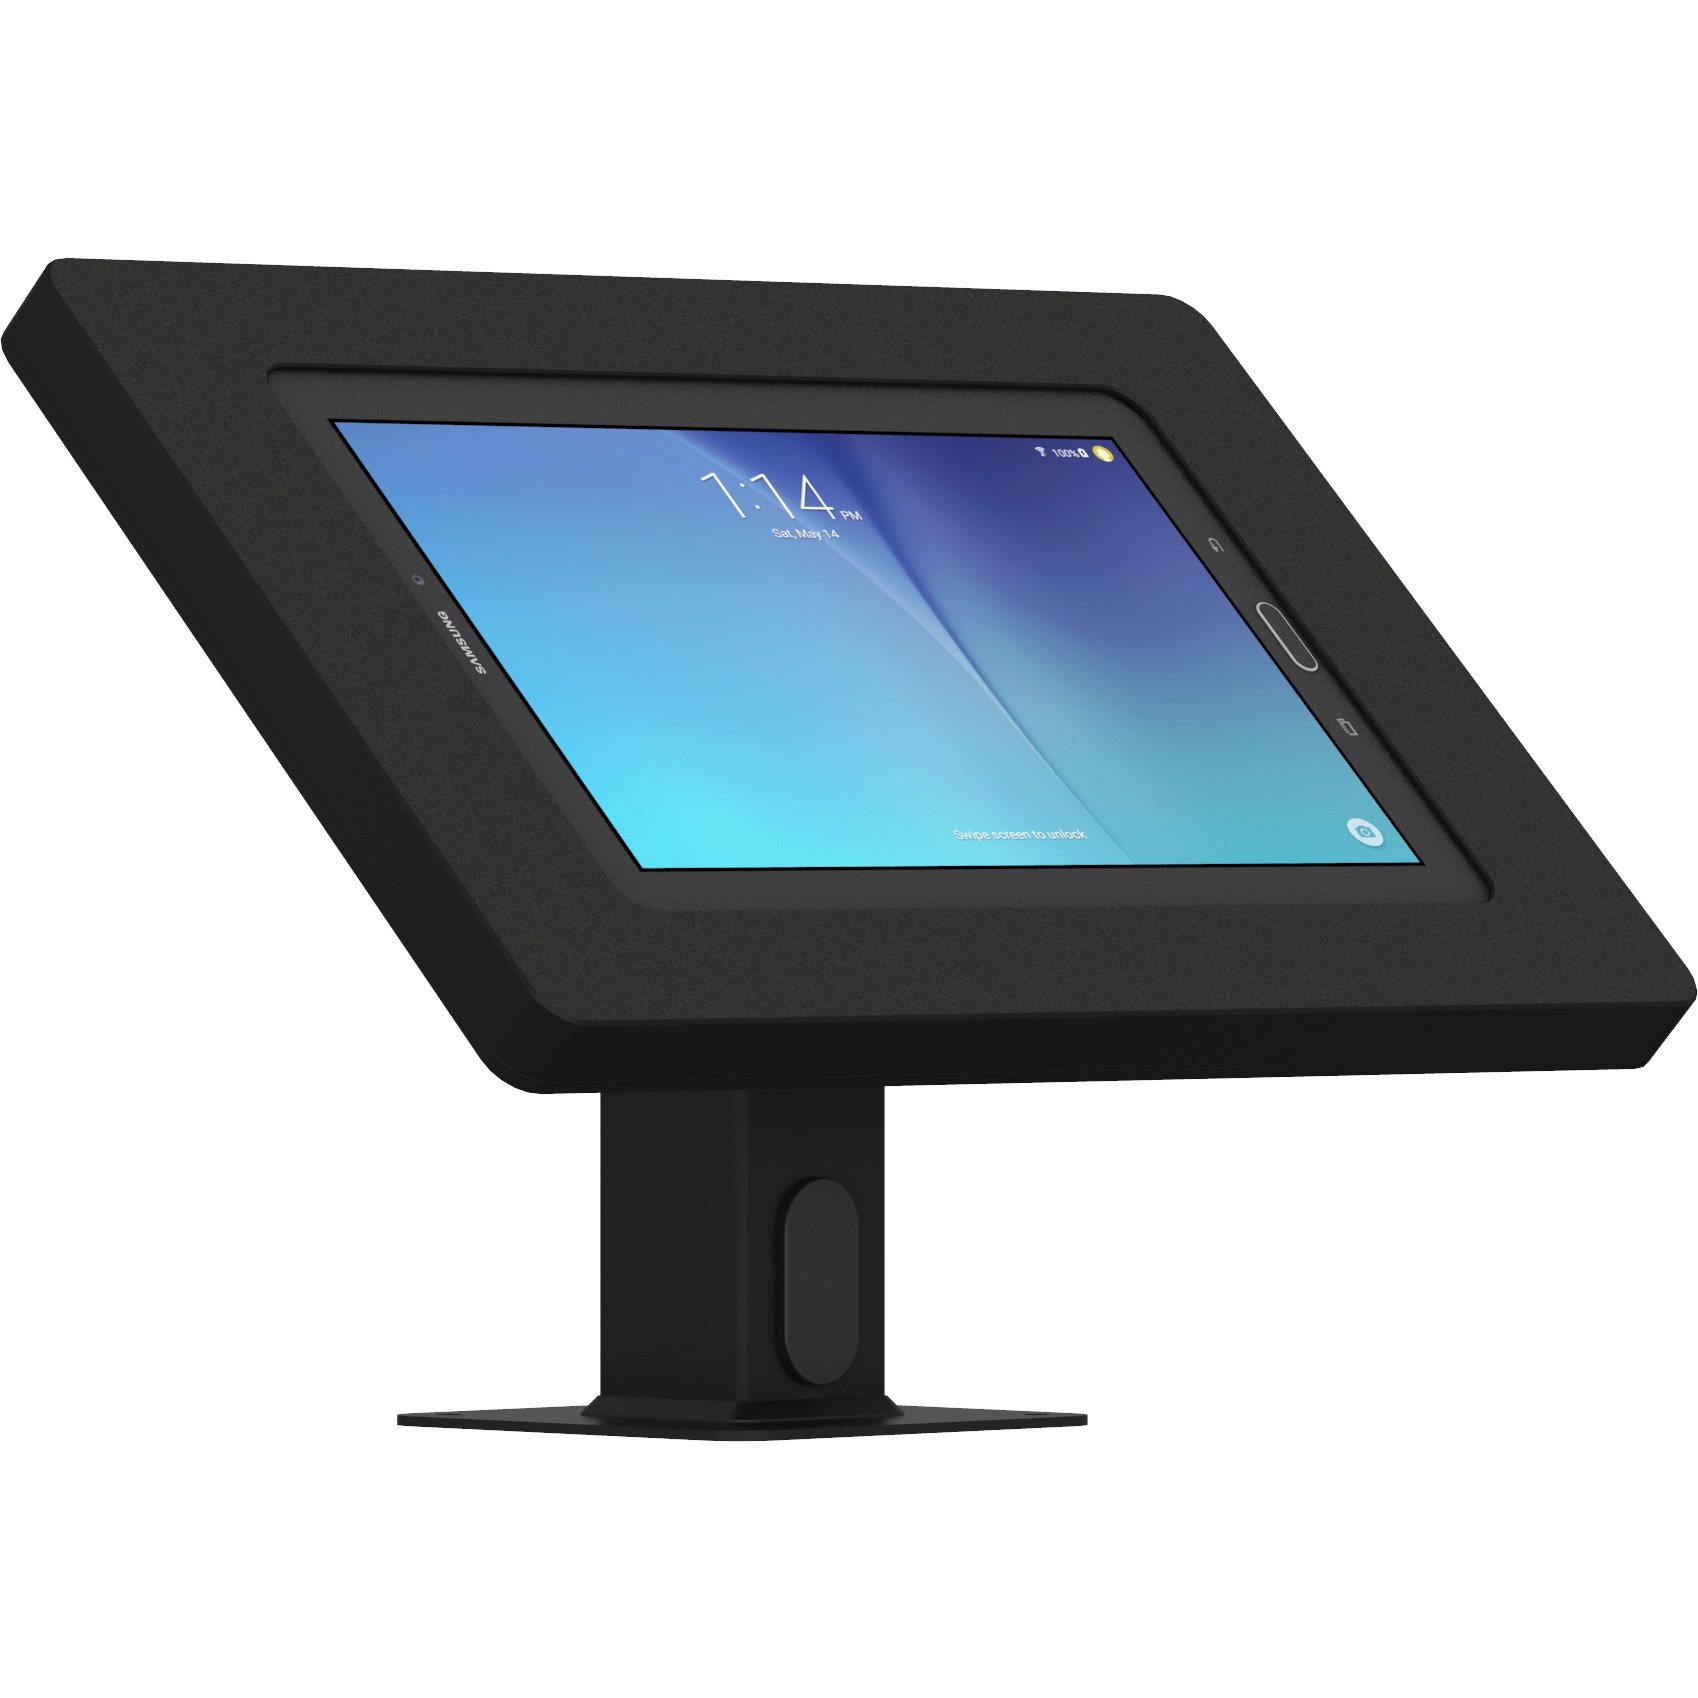 VidaMount Black Enclosure and Rotating & Tilting Desk/Table Mount [Bundle] Compatible with Samsung Galaxy Tab E 9.6